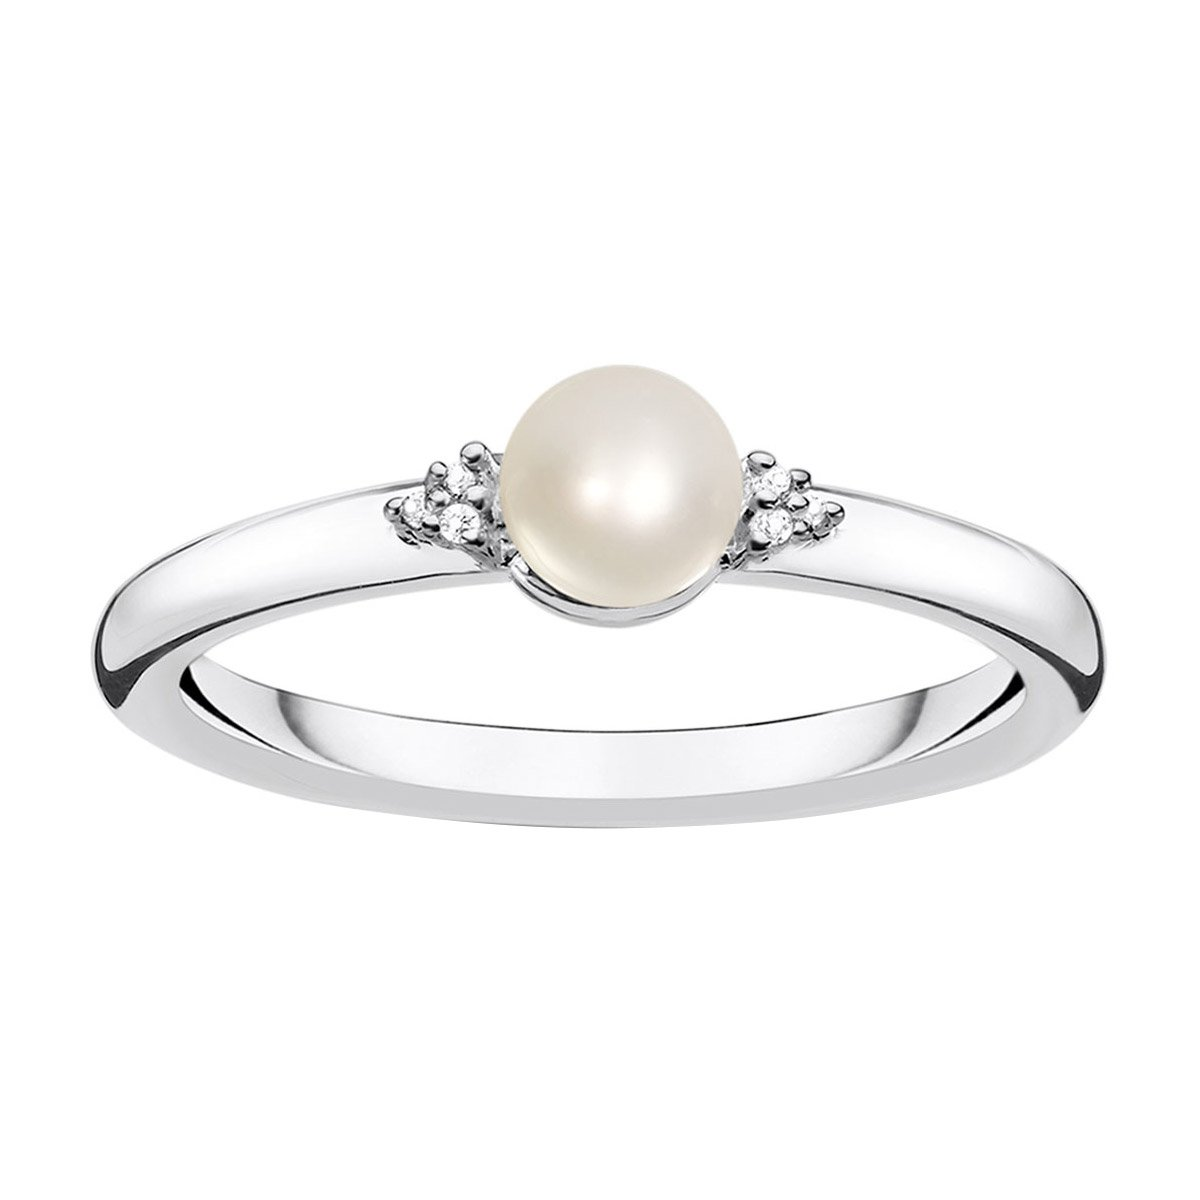 Thomas Sabo D_TR0039-765-14 Damen-Perlenring